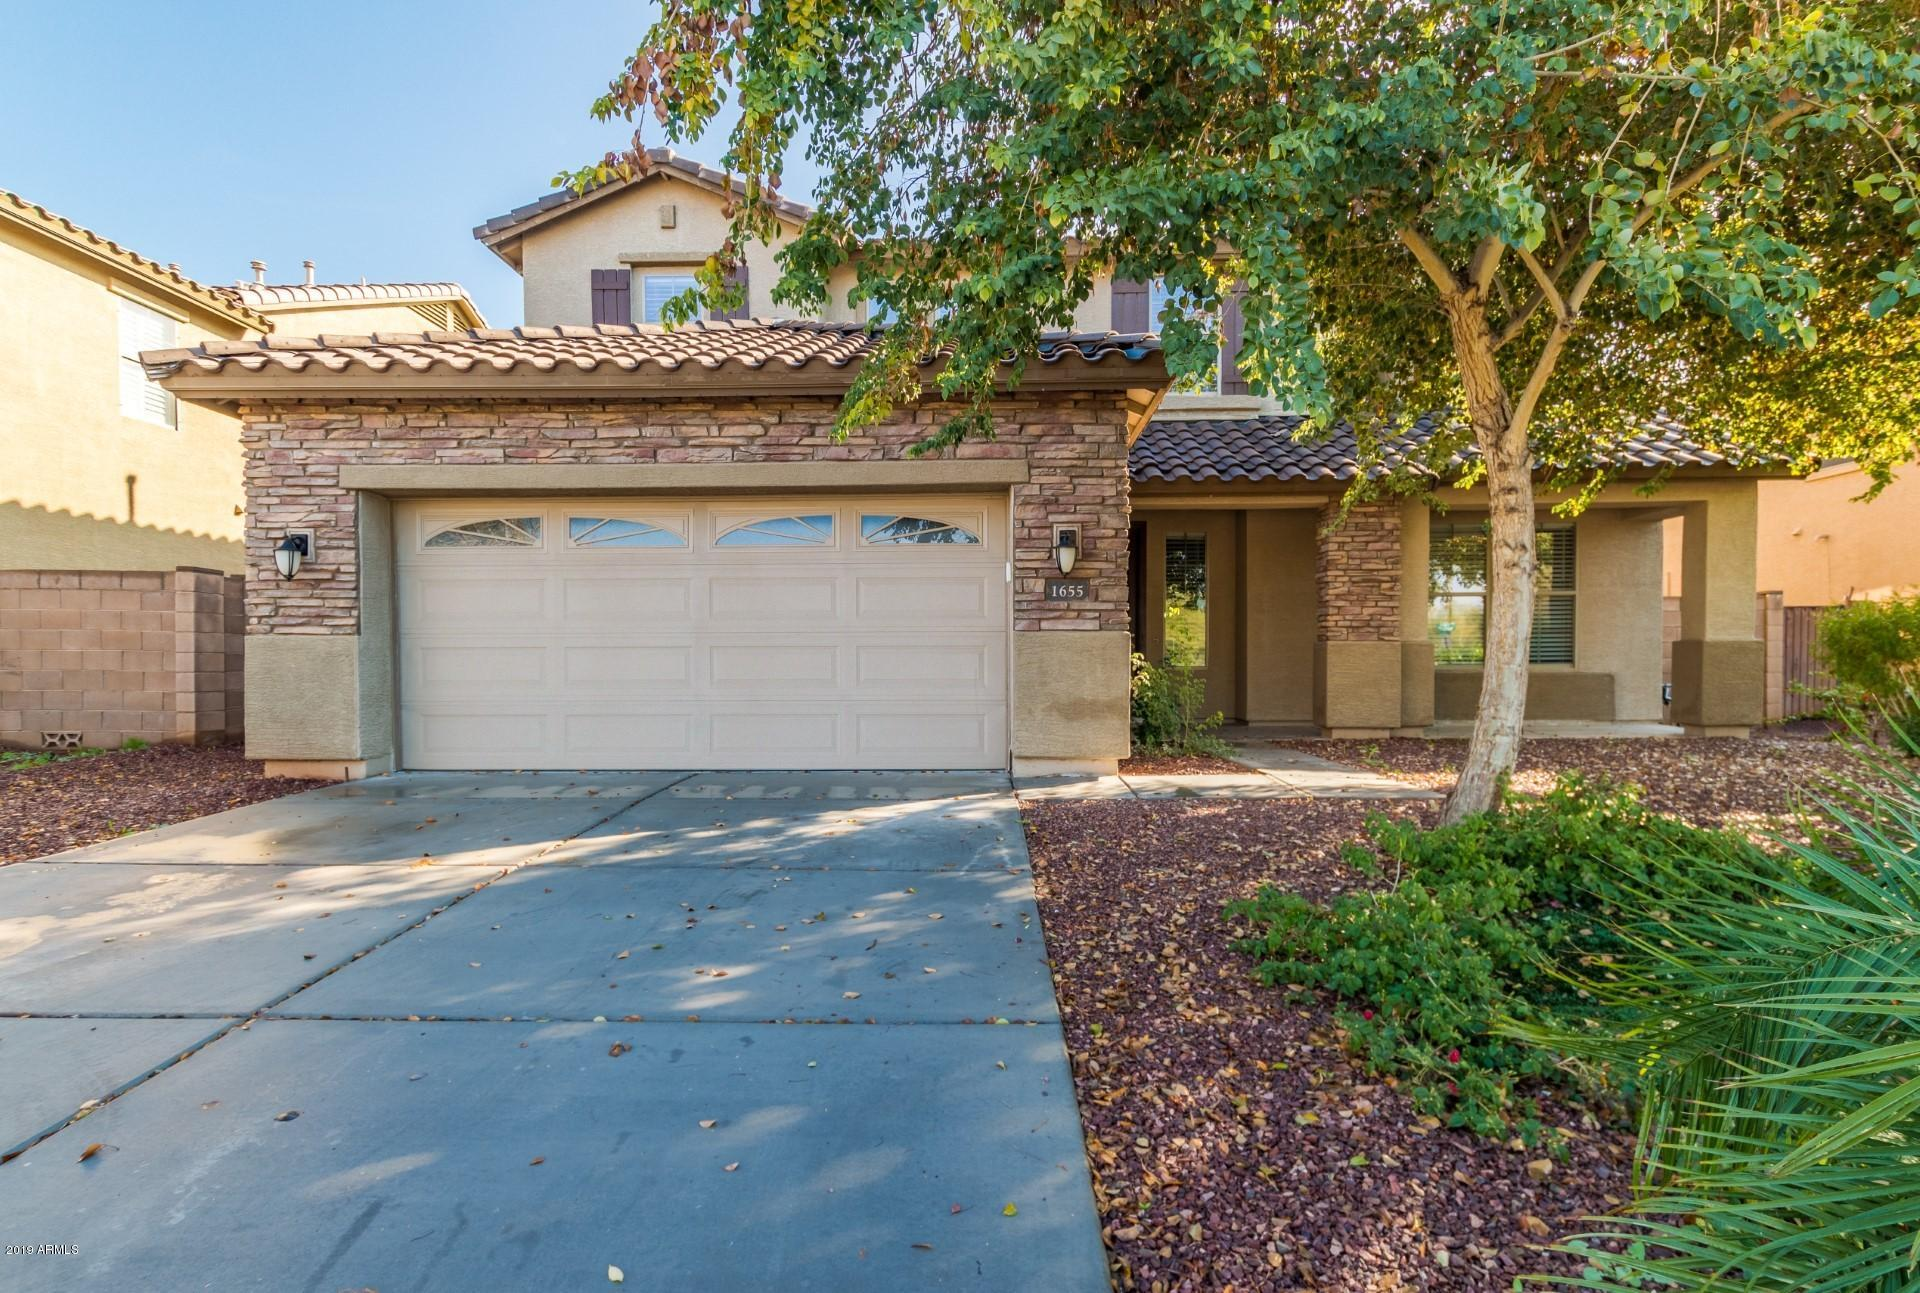 MLS 5839515 1655 N 113TH Avenue, Avondale, AZ 85392 Avondale AZ RV Park